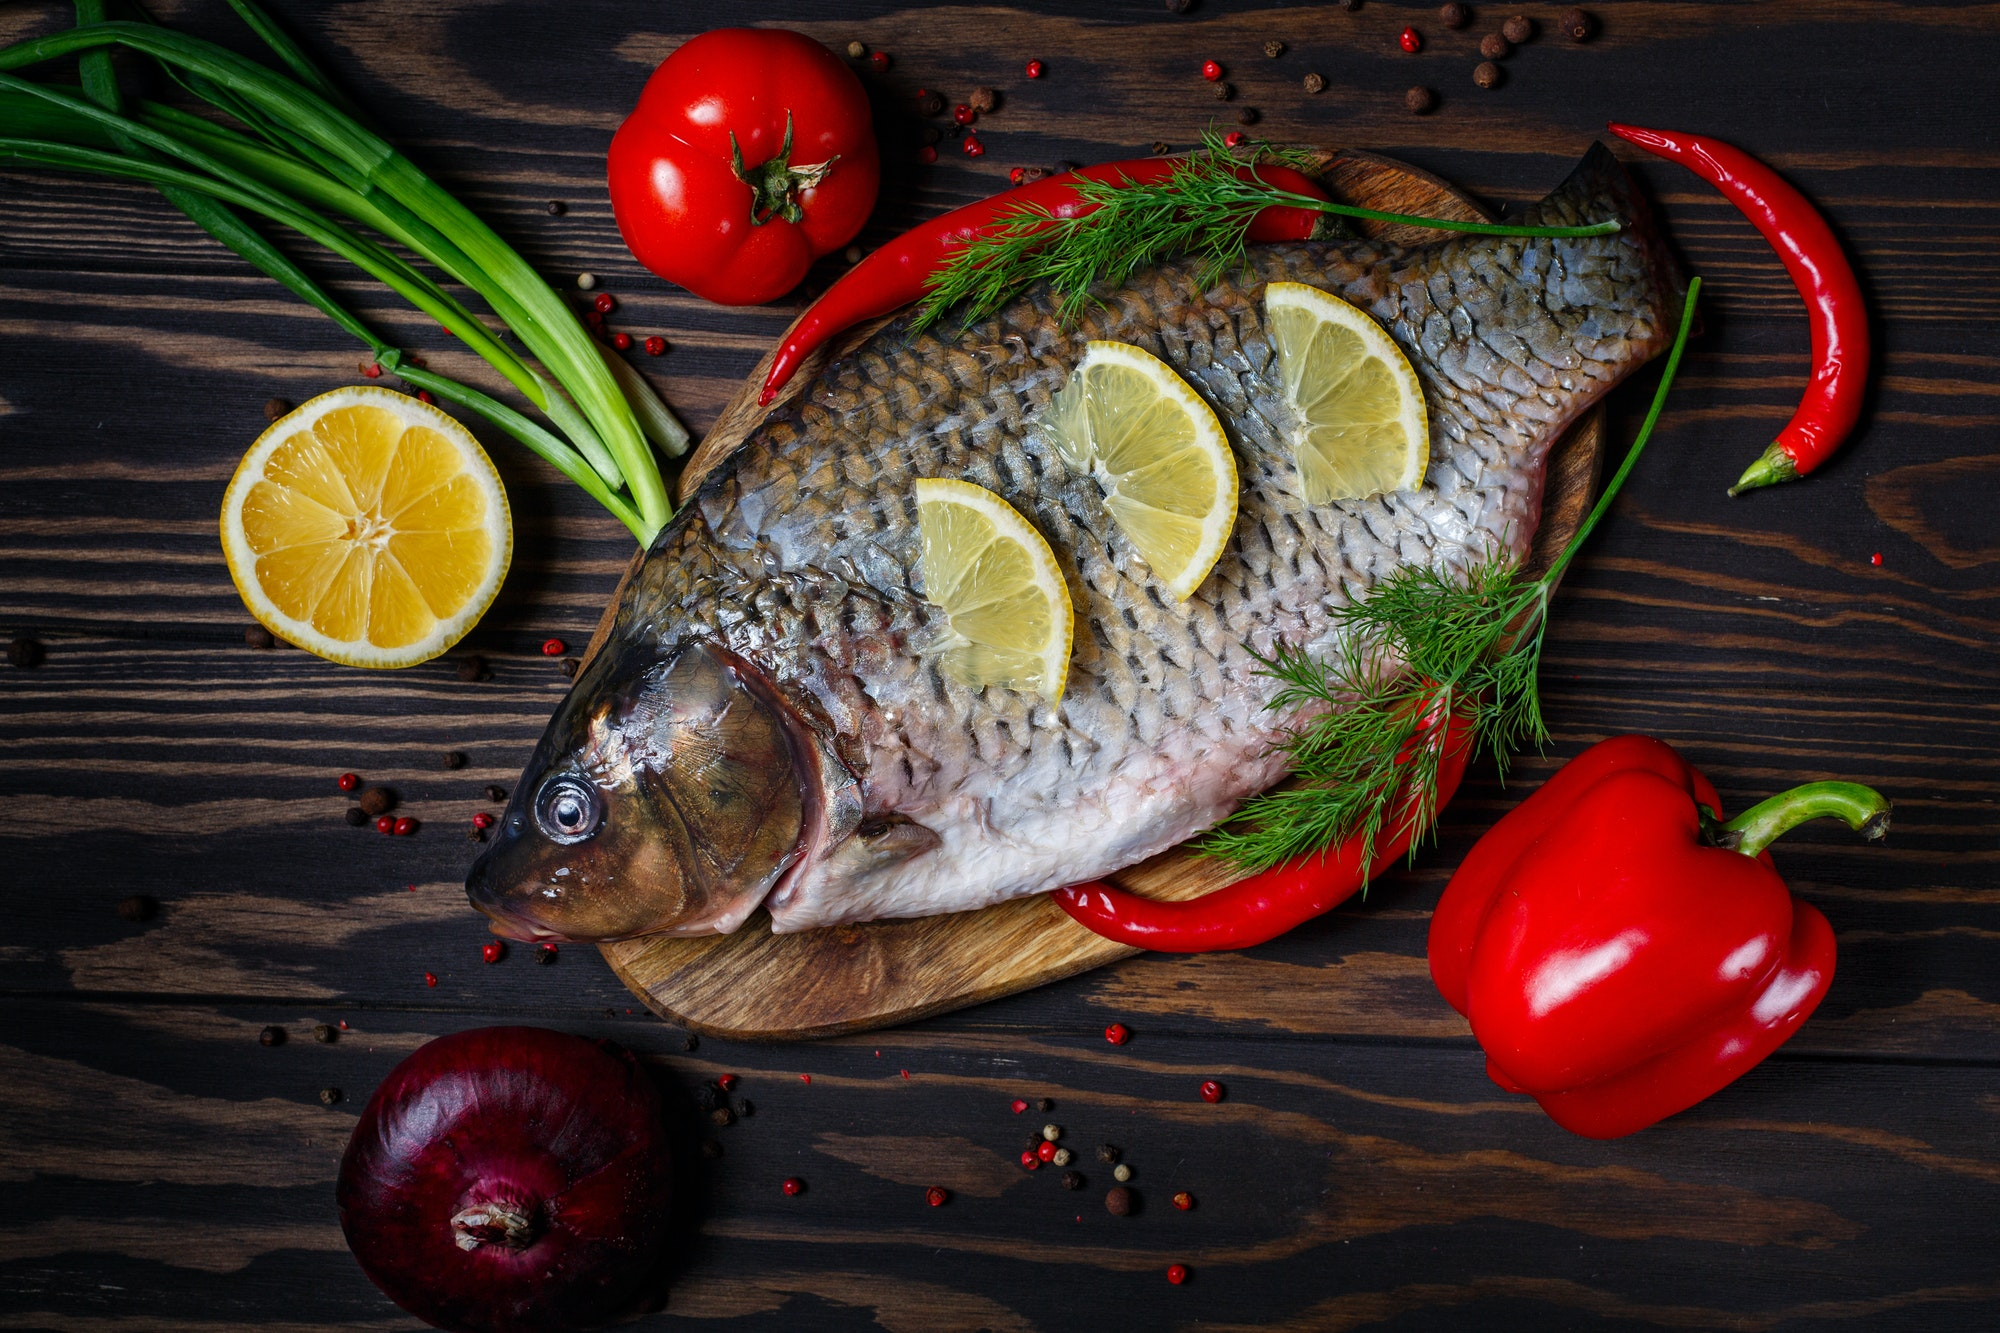 Carp fish with fresh vegetables